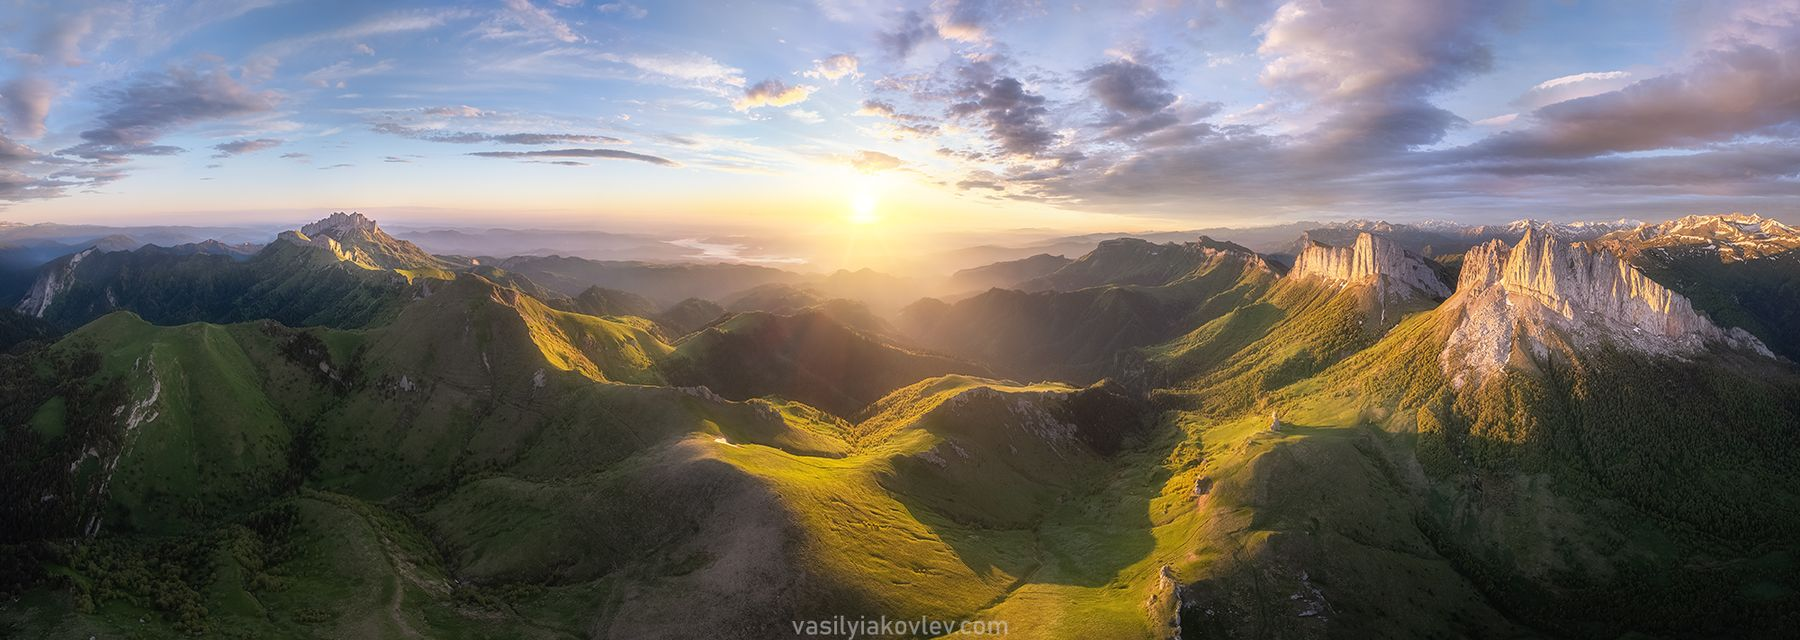 Панорама Природного парка Большой Тхач большой тхач фототур яковлевфототур адыгея кавказ ачешбок